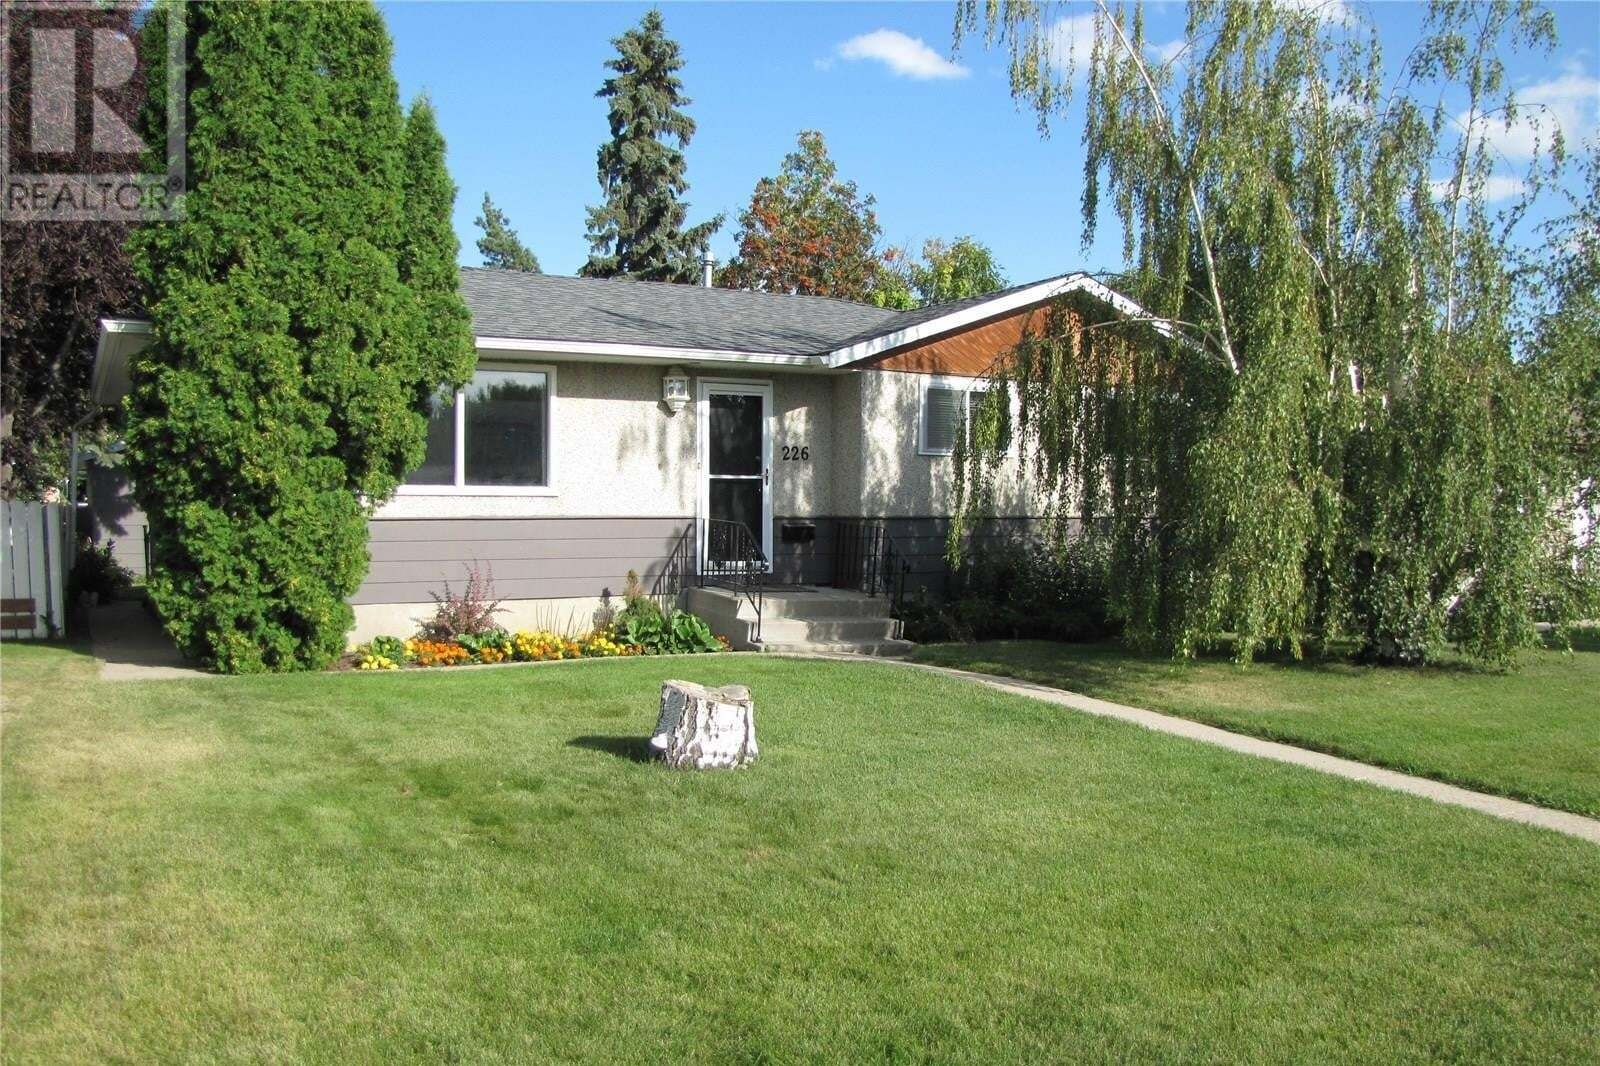 House for sale at 226 Montreal Ave N Saskatoon Saskatchewan - MLS: SK824103